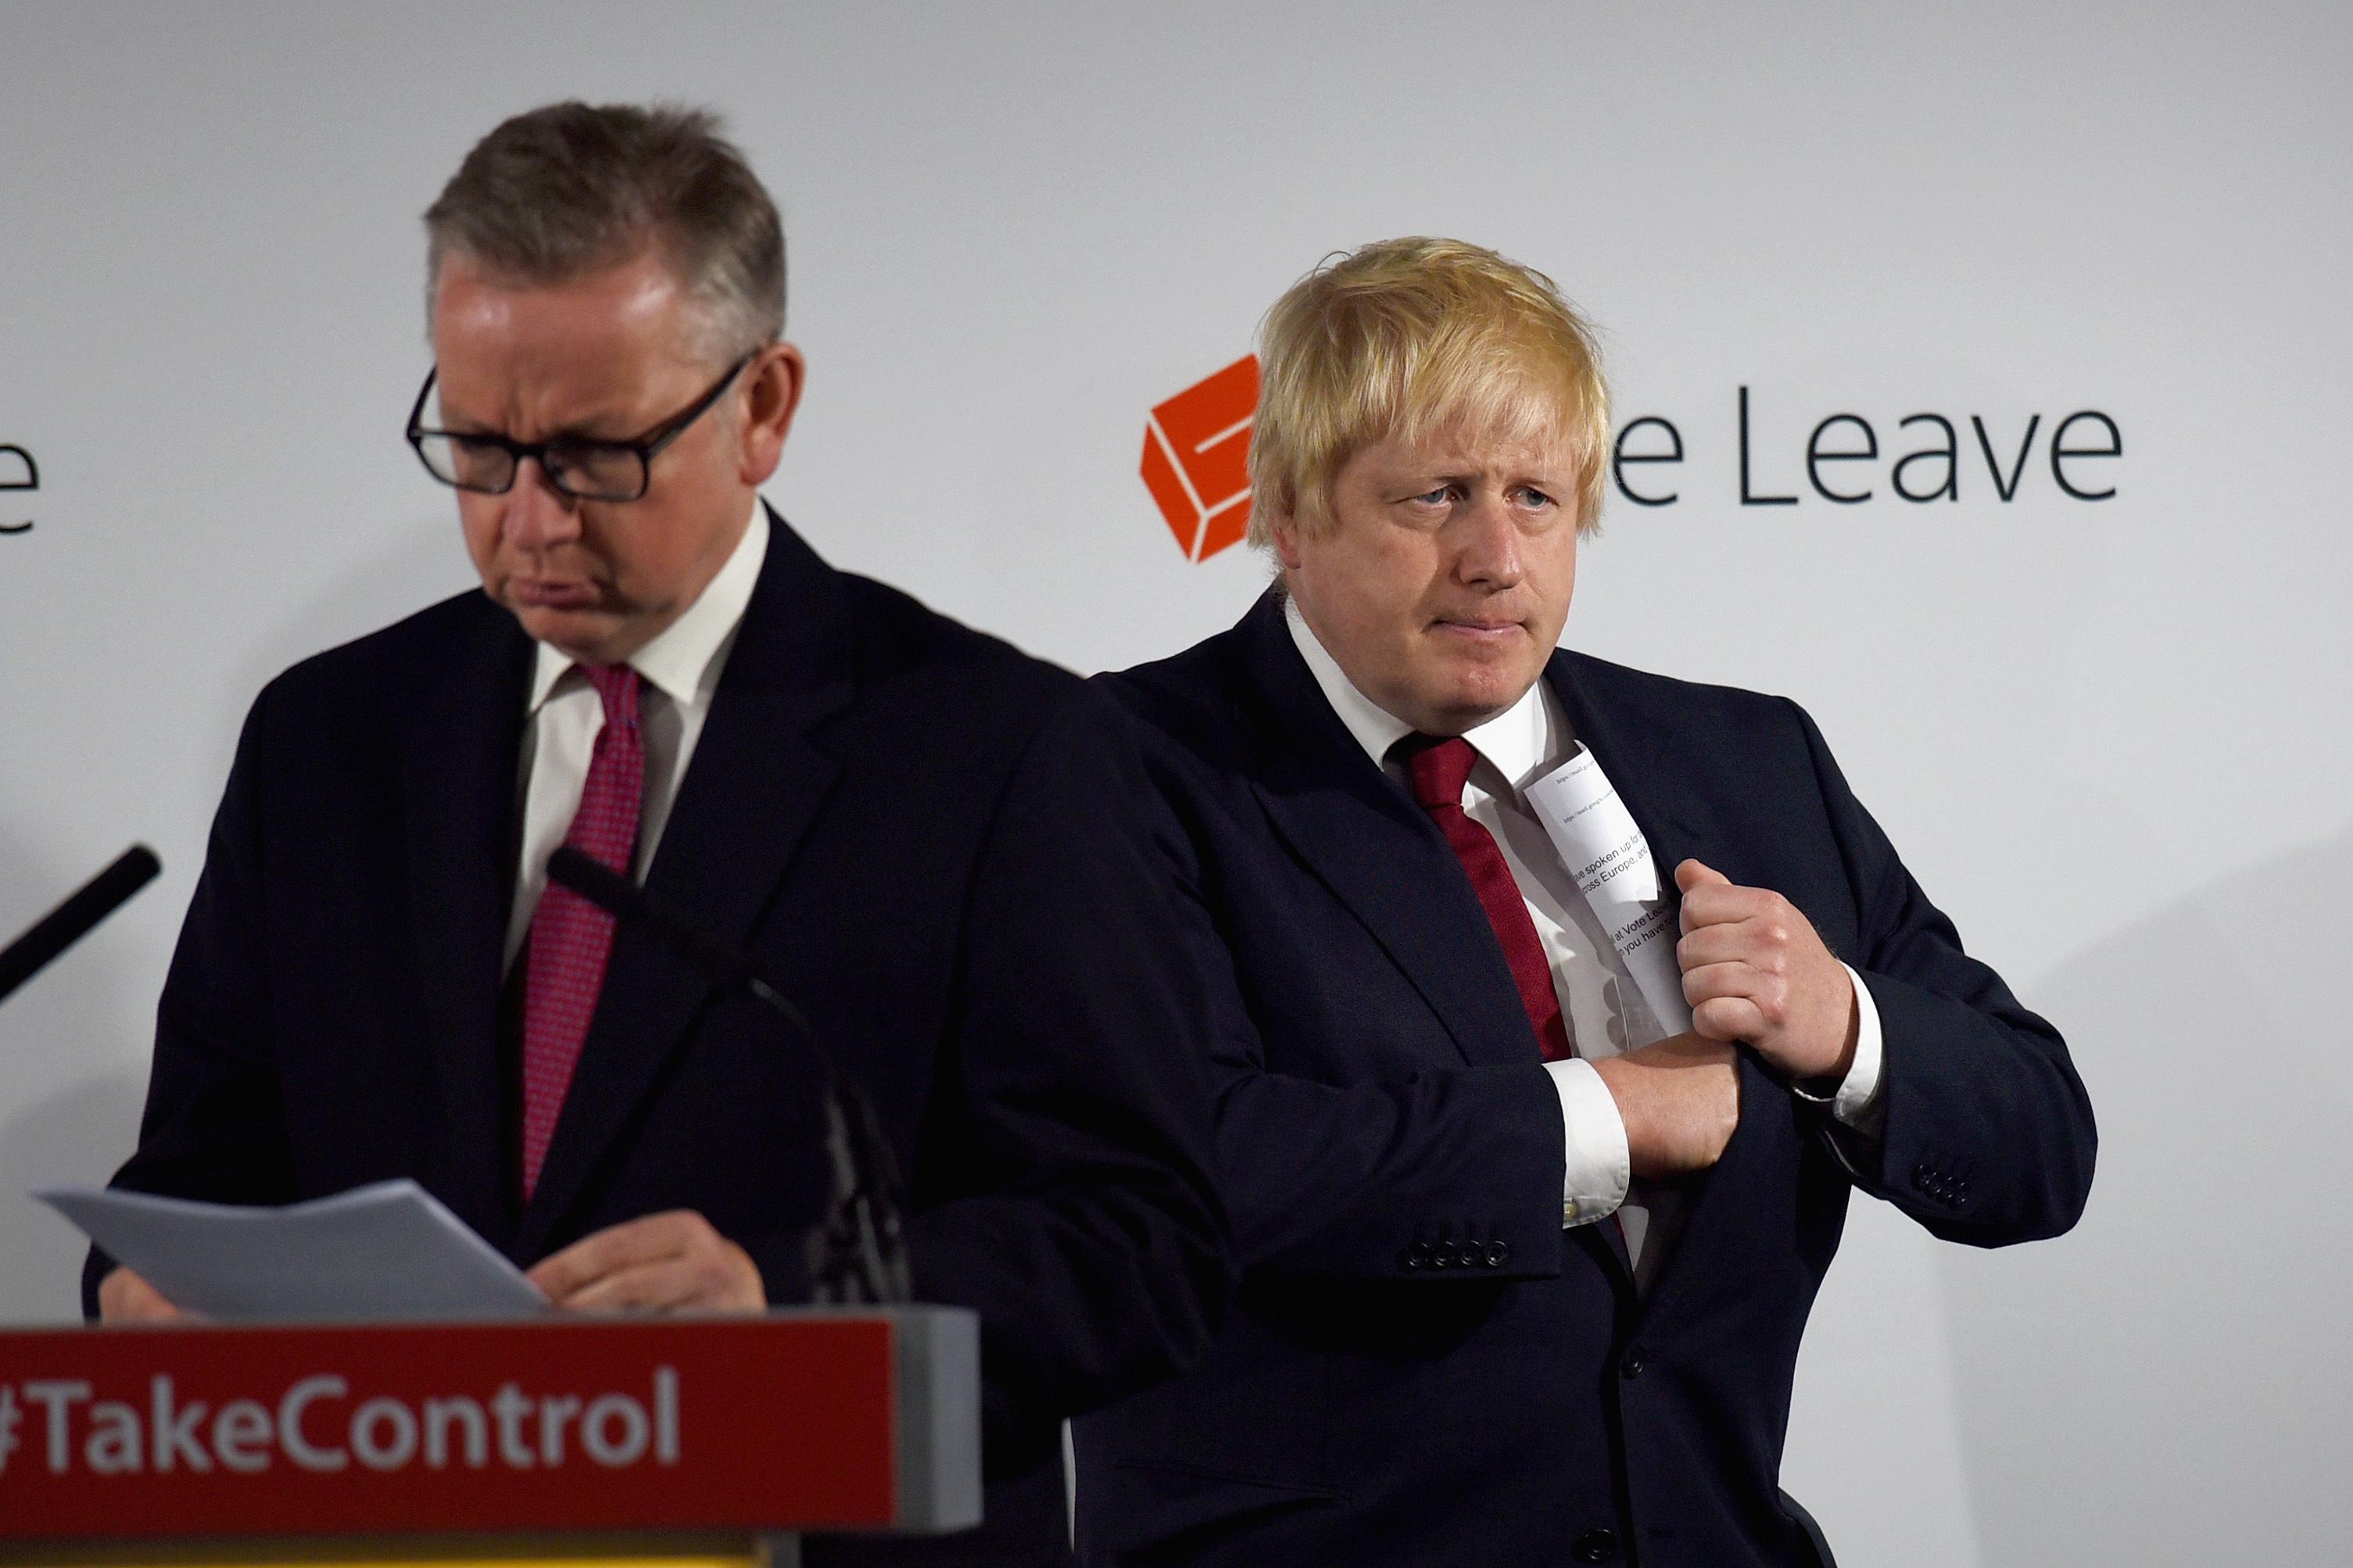 Michael Gove and Boris Johnson at a Vote Leave victory press conference.